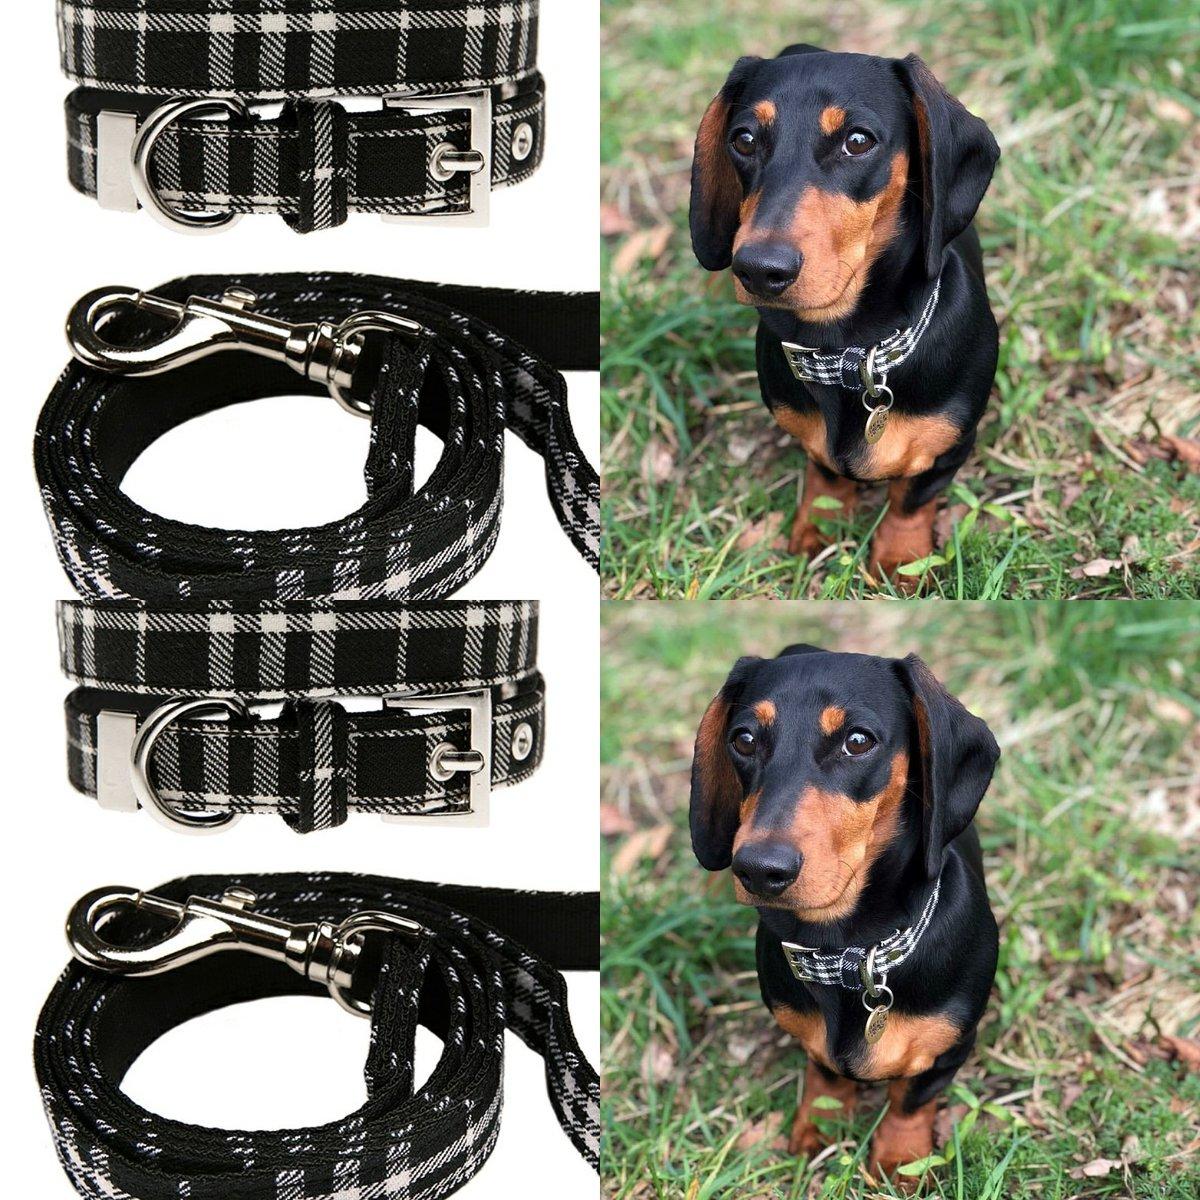 Gorgeous Elvis sporting his new #BlackWhite #tartan #collar from @UrbanPup. Fabulous! #tuesdayselfies #fashion #leads  <br>http://pic.twitter.com/eJelkwdjlZ